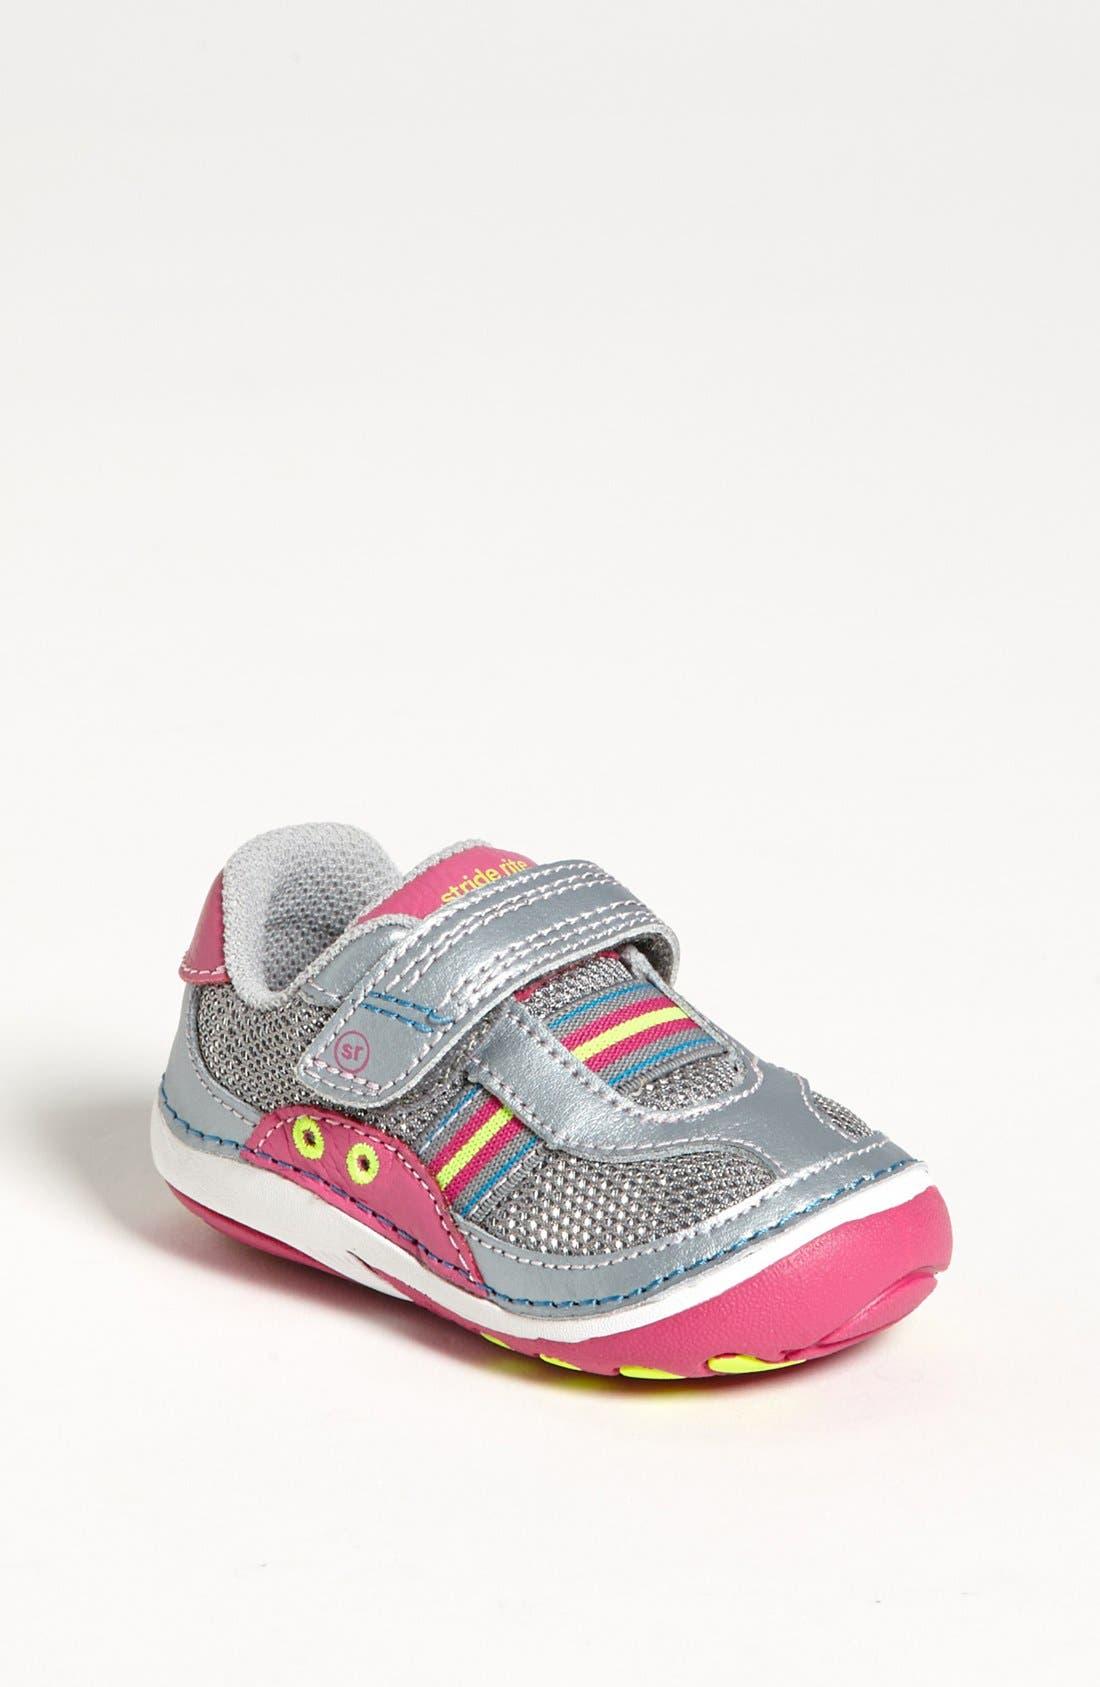 Alternate Image 1 Selected - Stride Rite 'Aldrin' Sneaker (Baby & Walker)